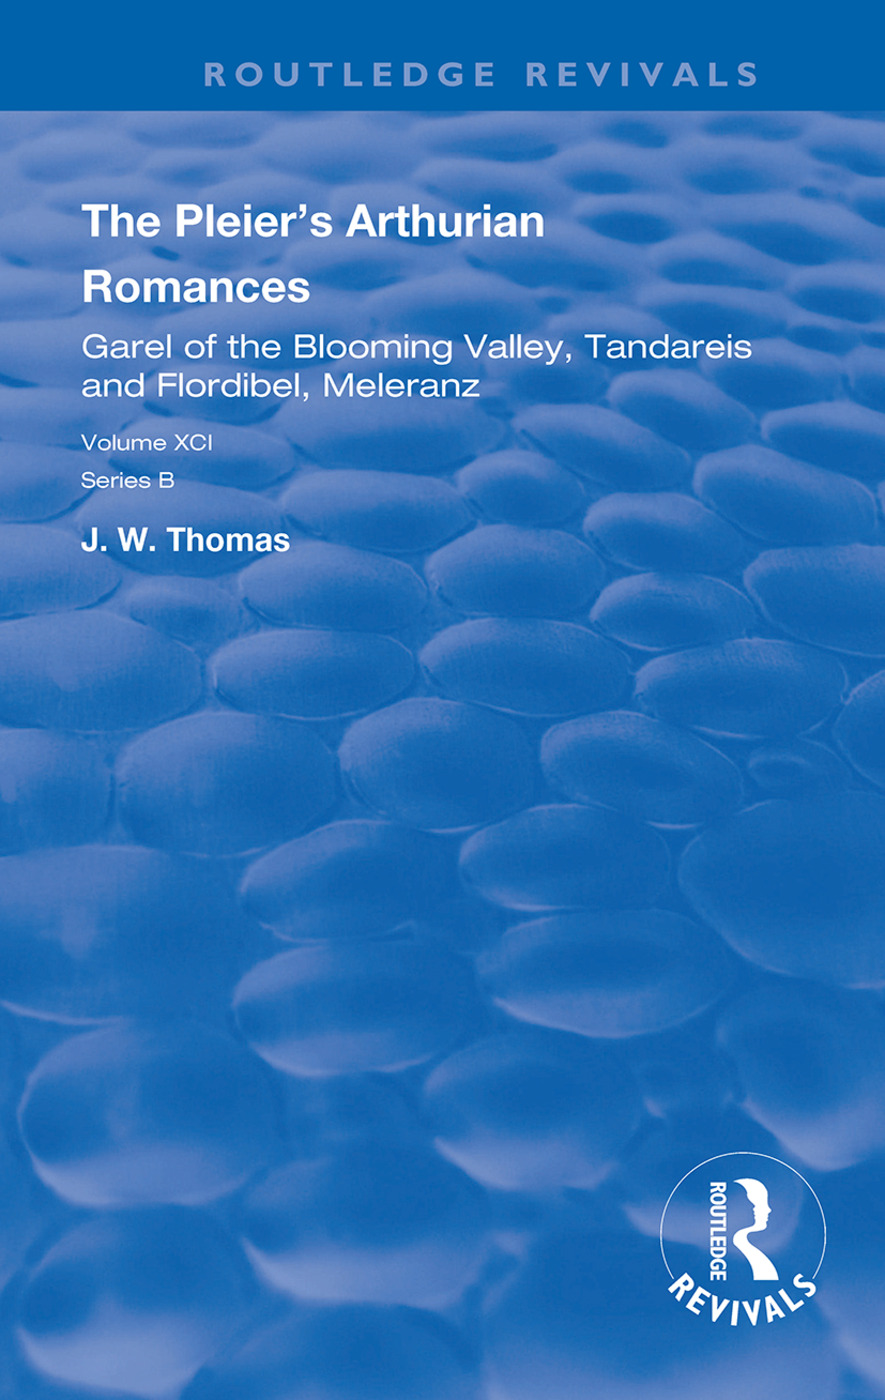 The Pleier's Arthurian Romances: Garel of the Blooming Valley, Tandareis and Floribel, Meleranz book cover